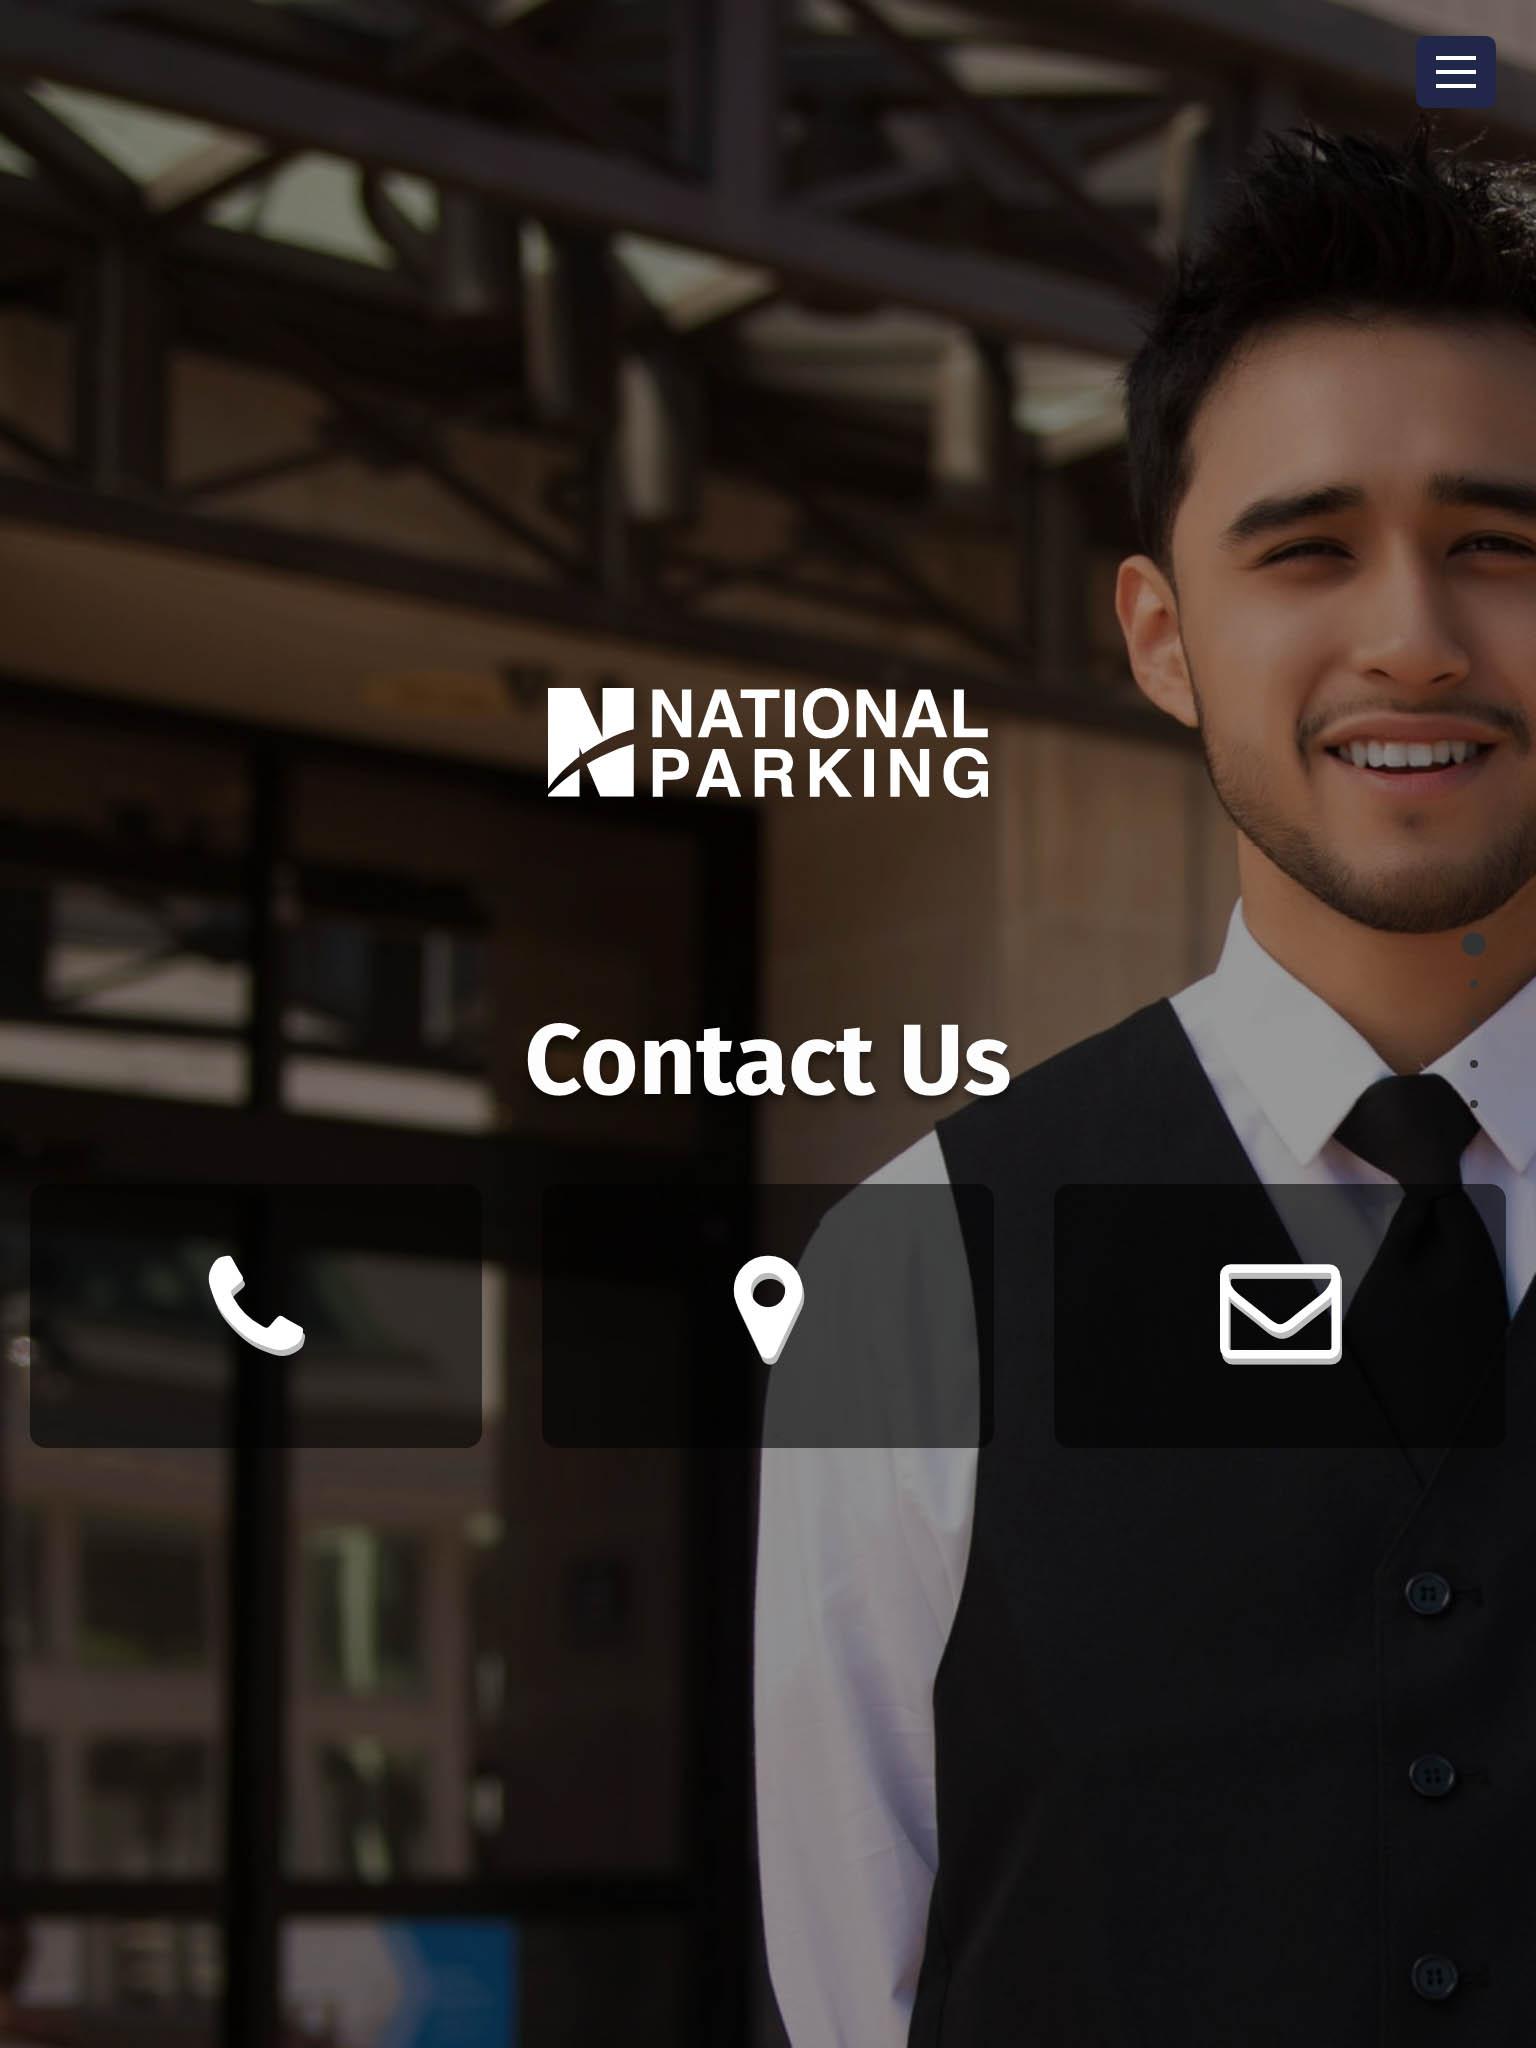 national-parking-atlanta-tablet-web-design-screenshot-3